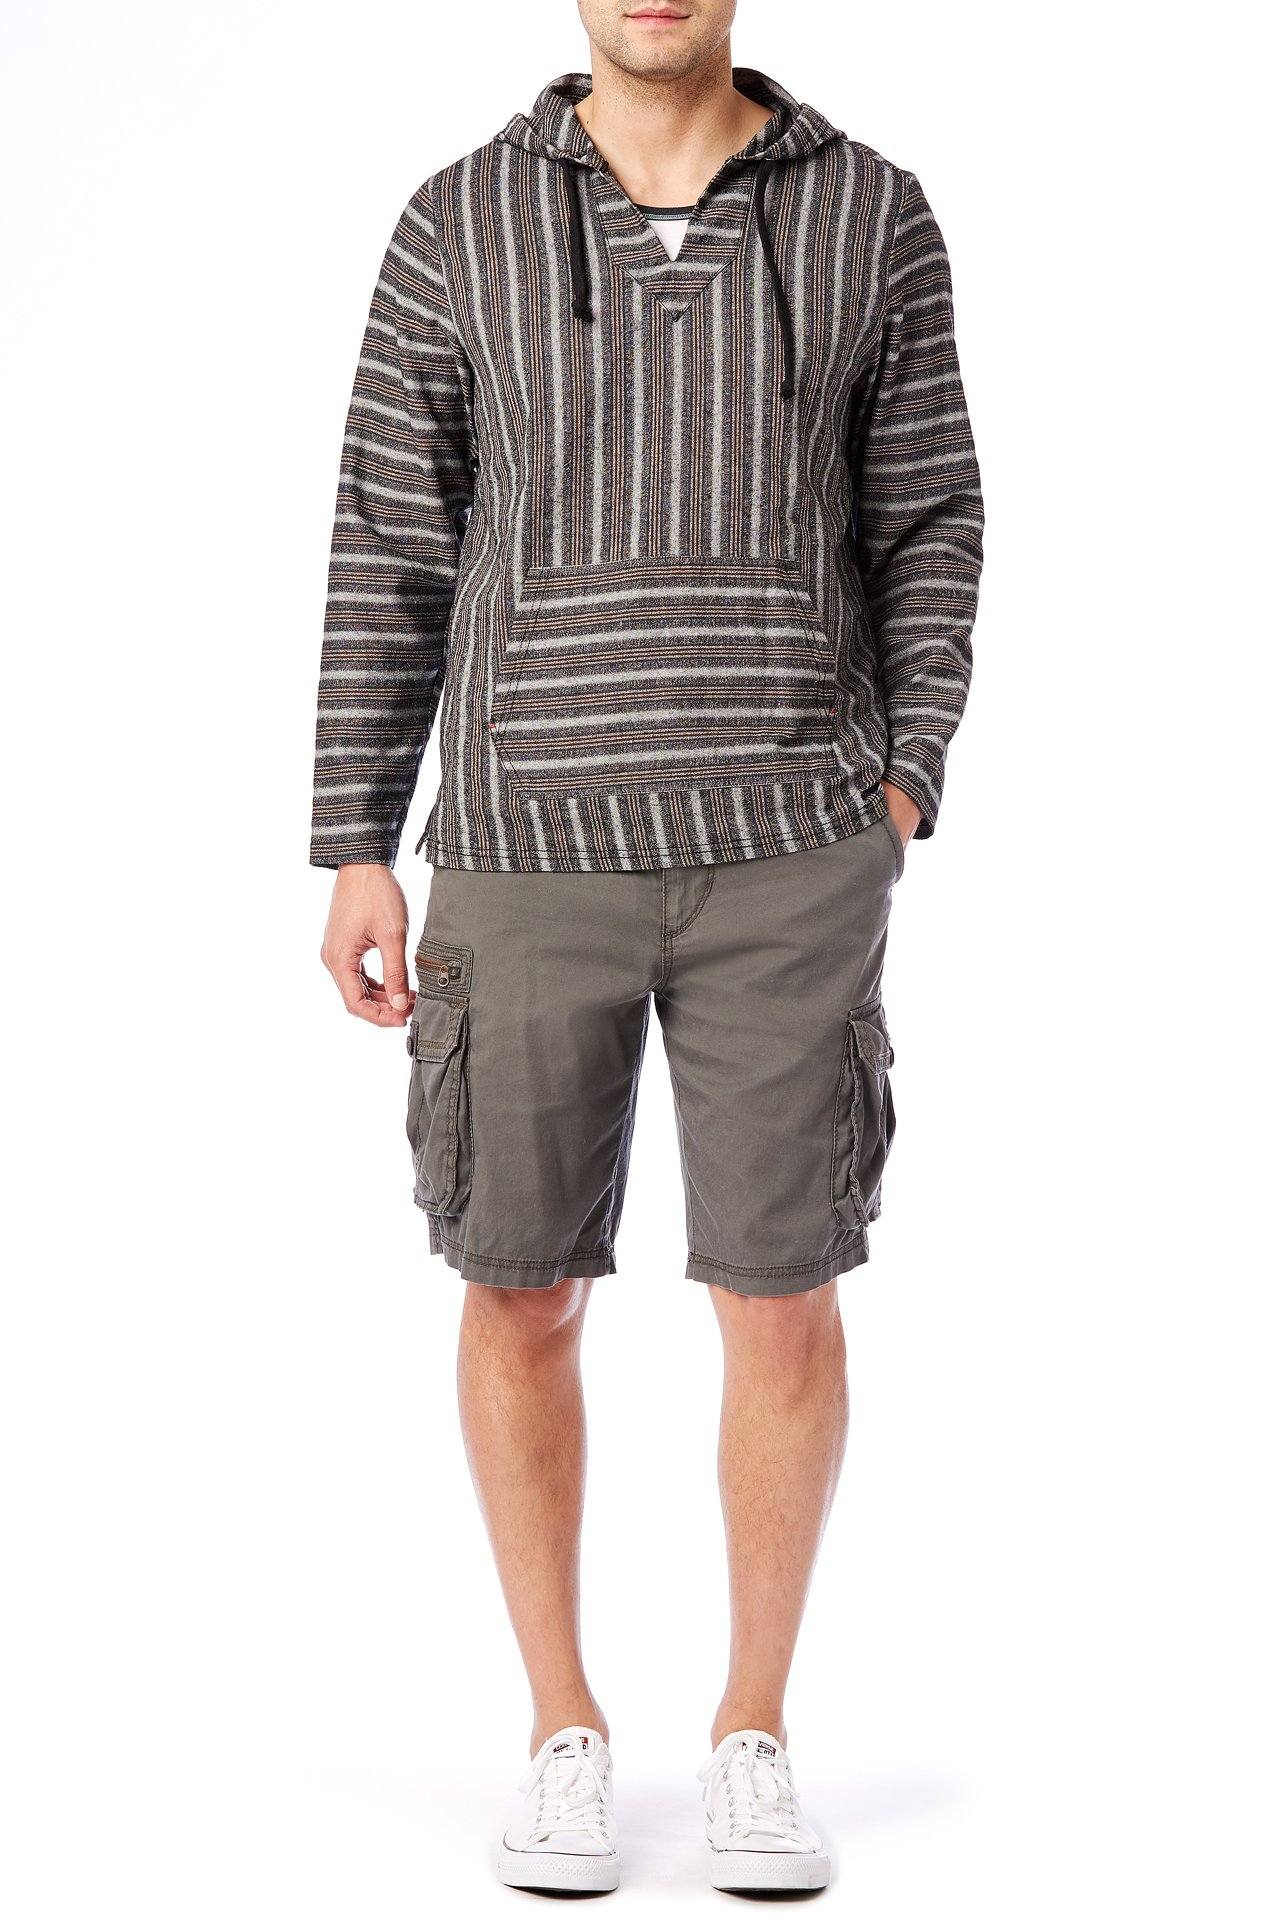 UNIONBAY Men's Stretch Fresh Twill Relaxed Fit Zipper Cargo Short, Flint, 38 by UNIONBAY (Image #3)